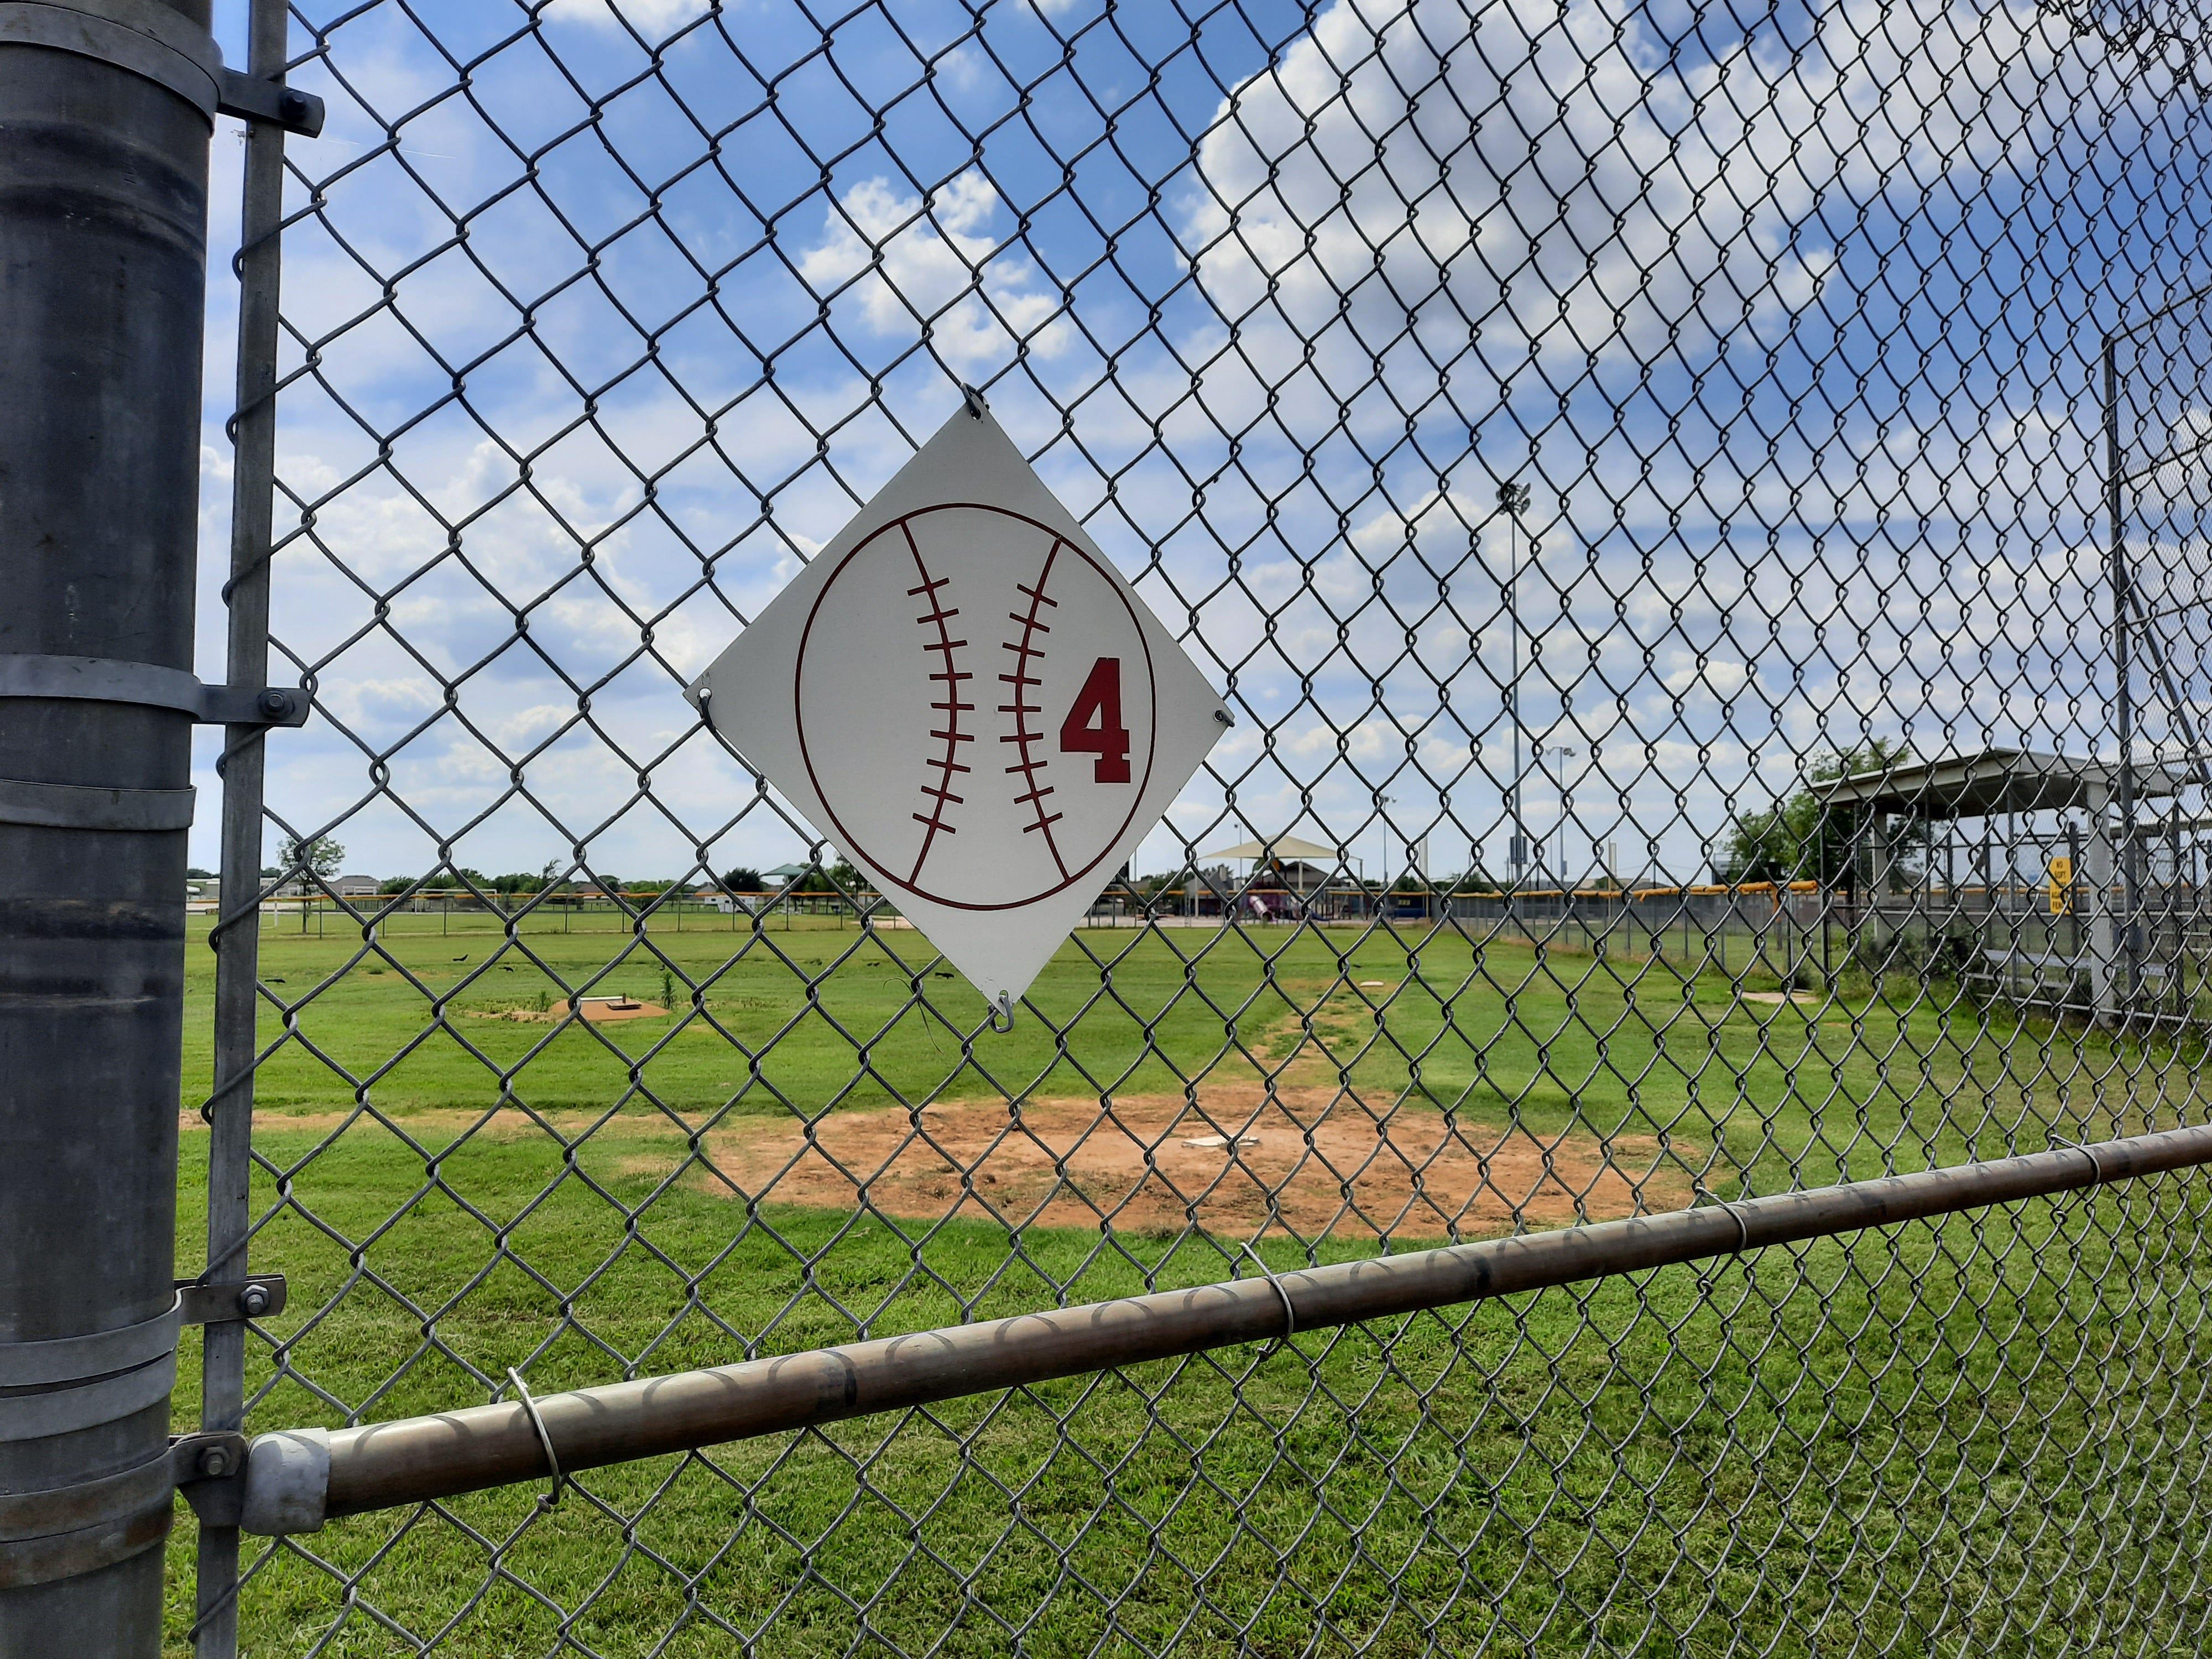 Baseball field fence